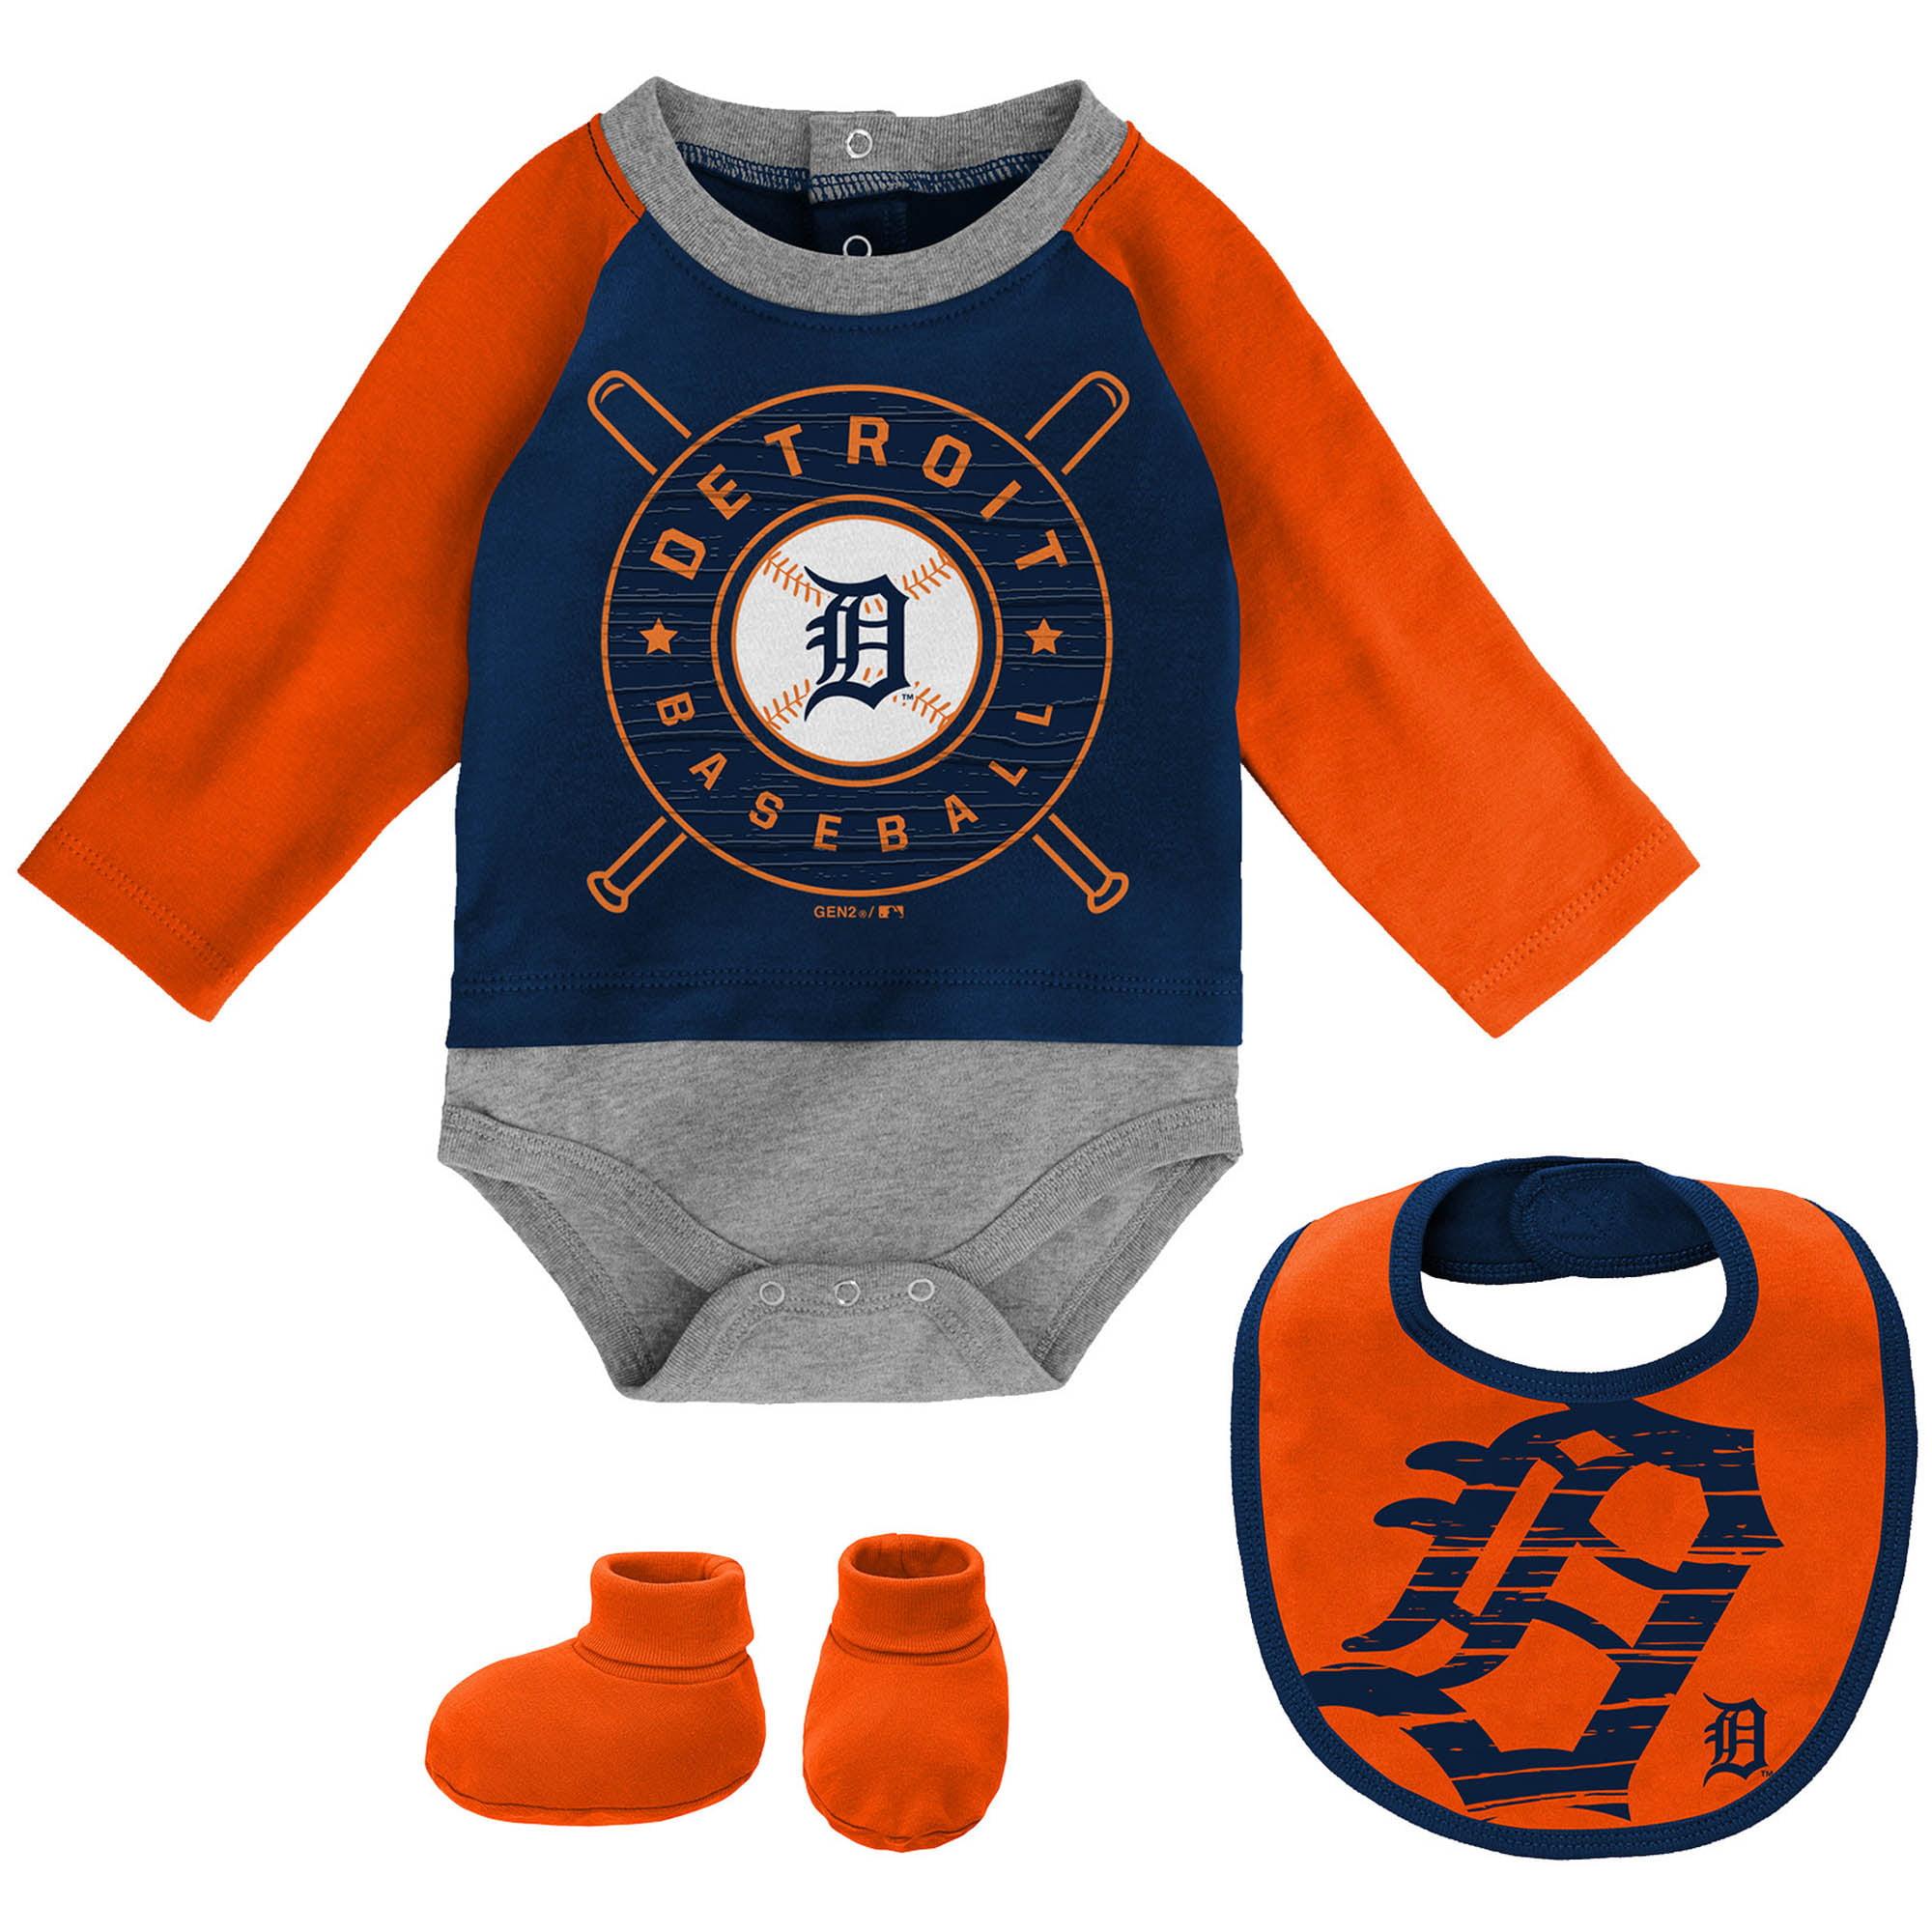 Detroit Tigers Newborn & Infant Dugout Dude Bodysuit, Bib & Booties Set - Navy/Orange